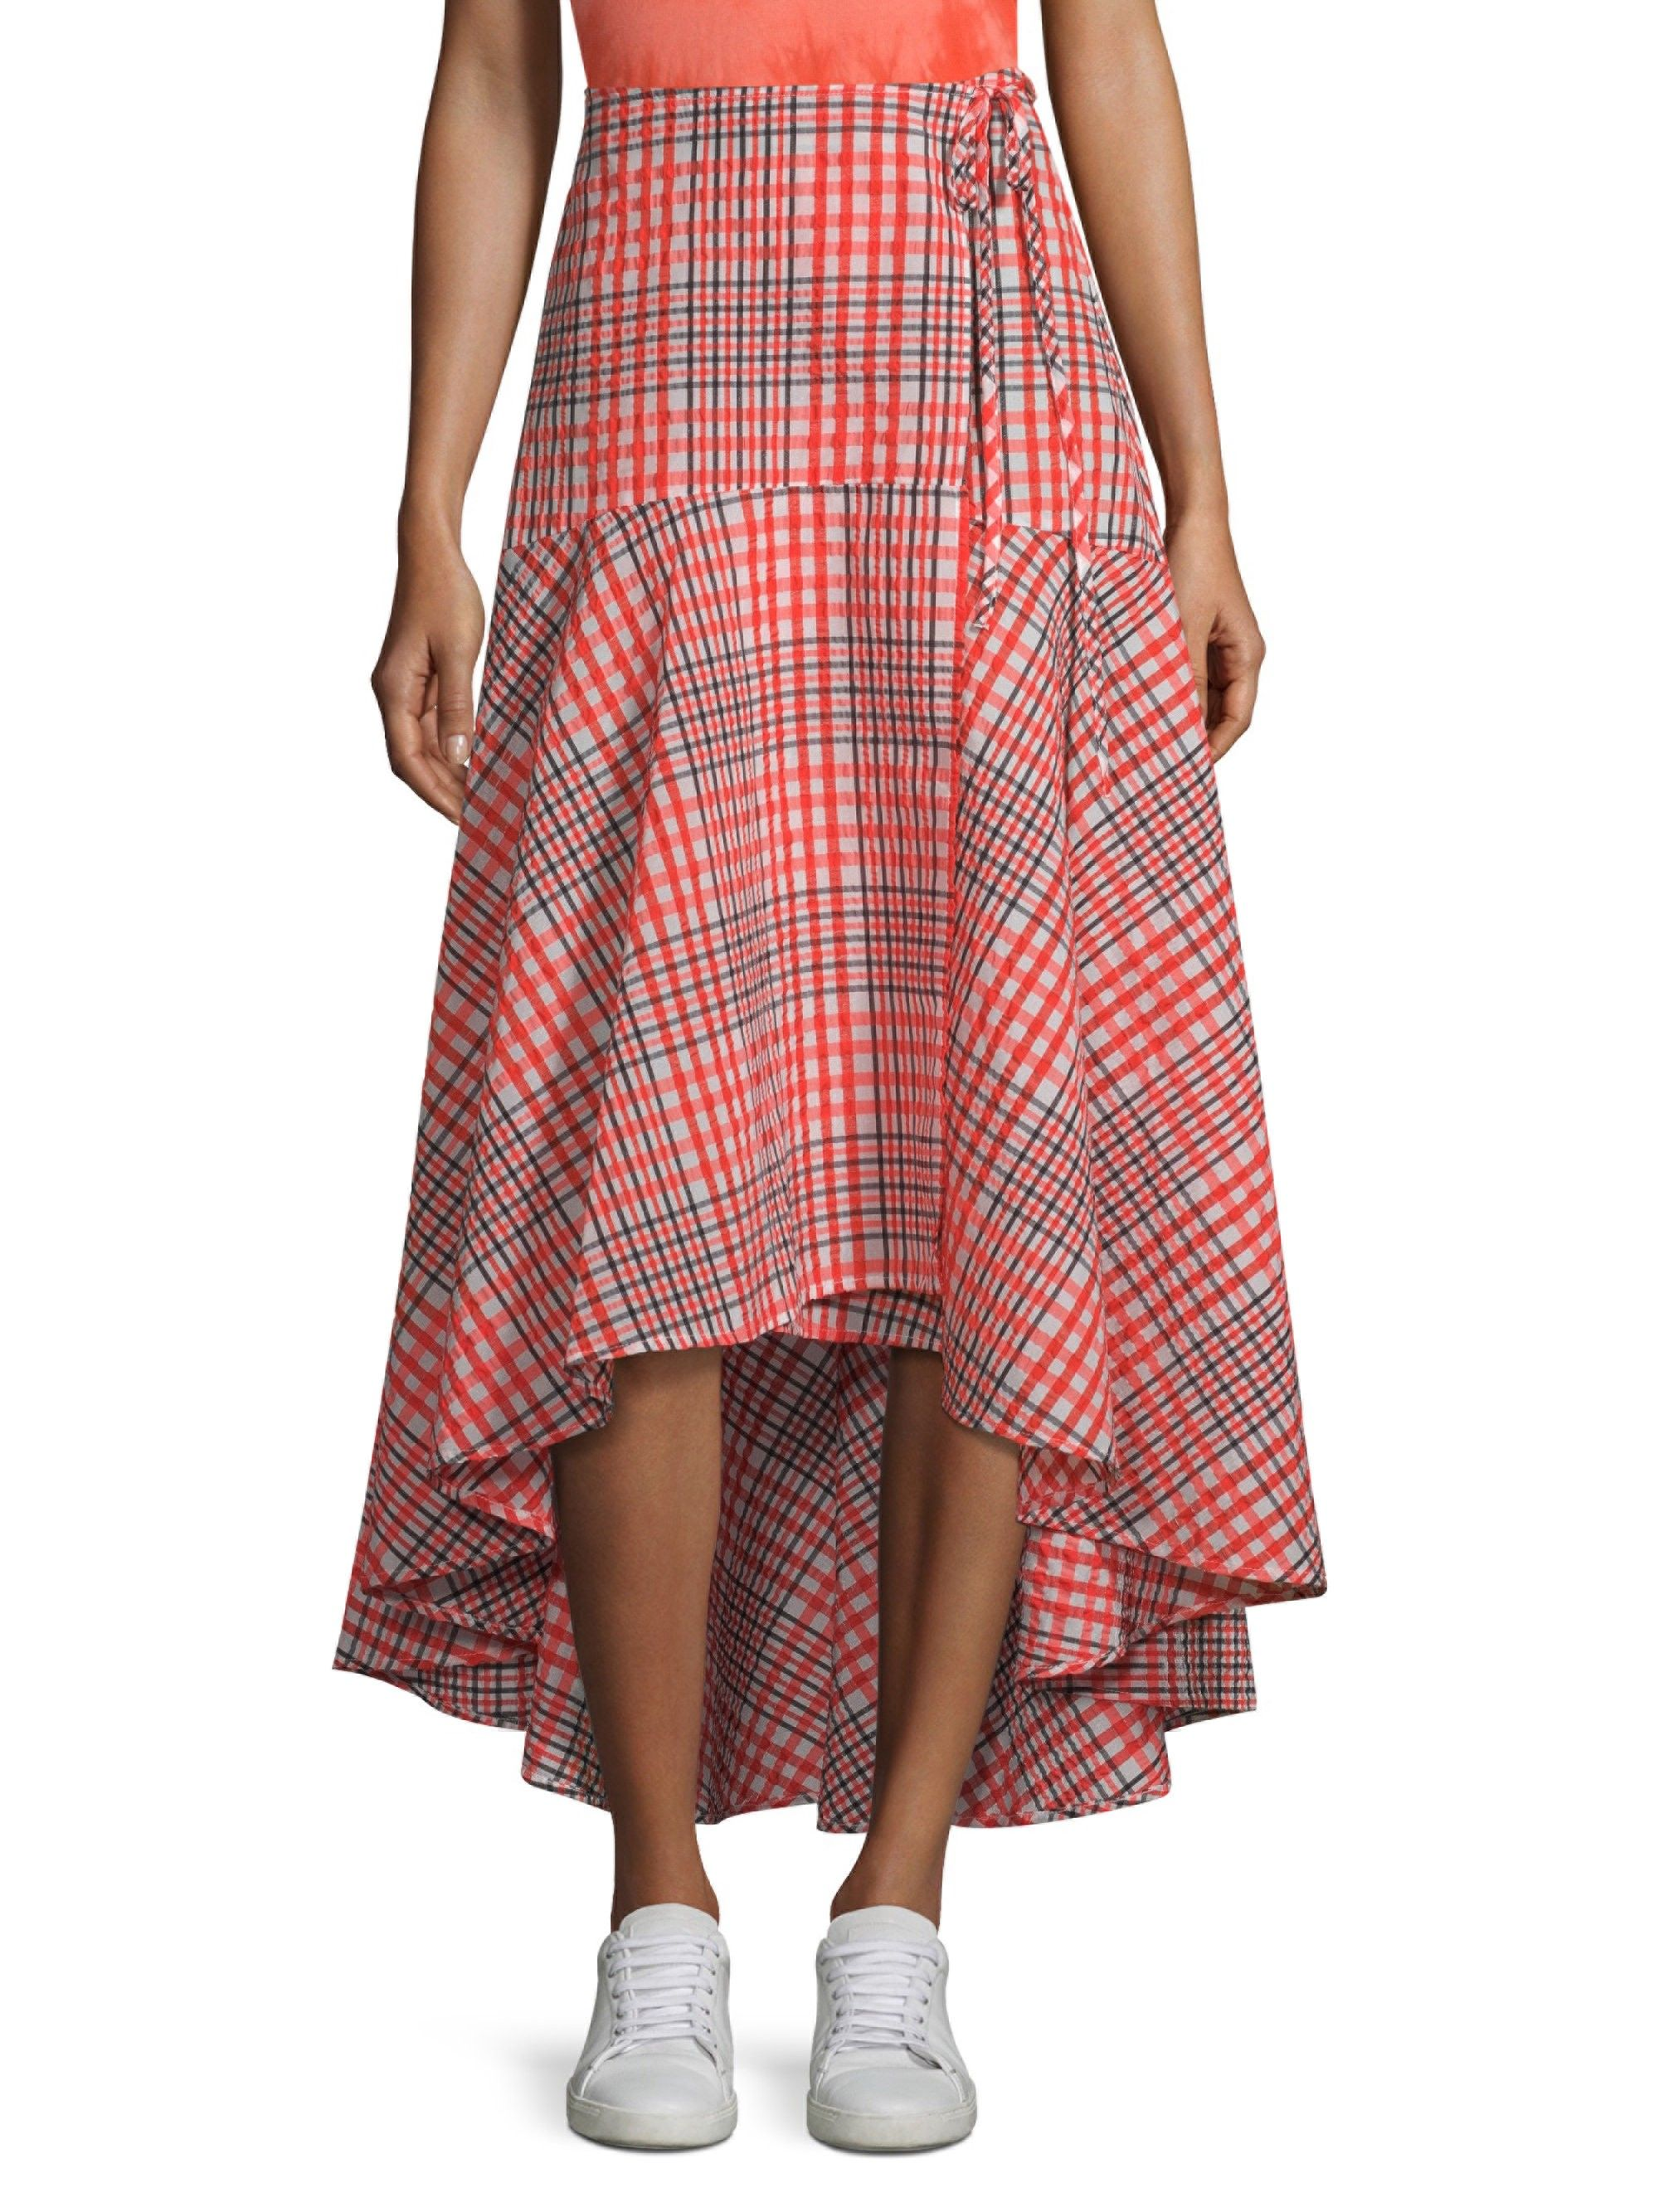 75b6cd37e8 Ganni Charron Plaid Wrap Skirt - Big Apple 40 (8) in 2019 | Products ...